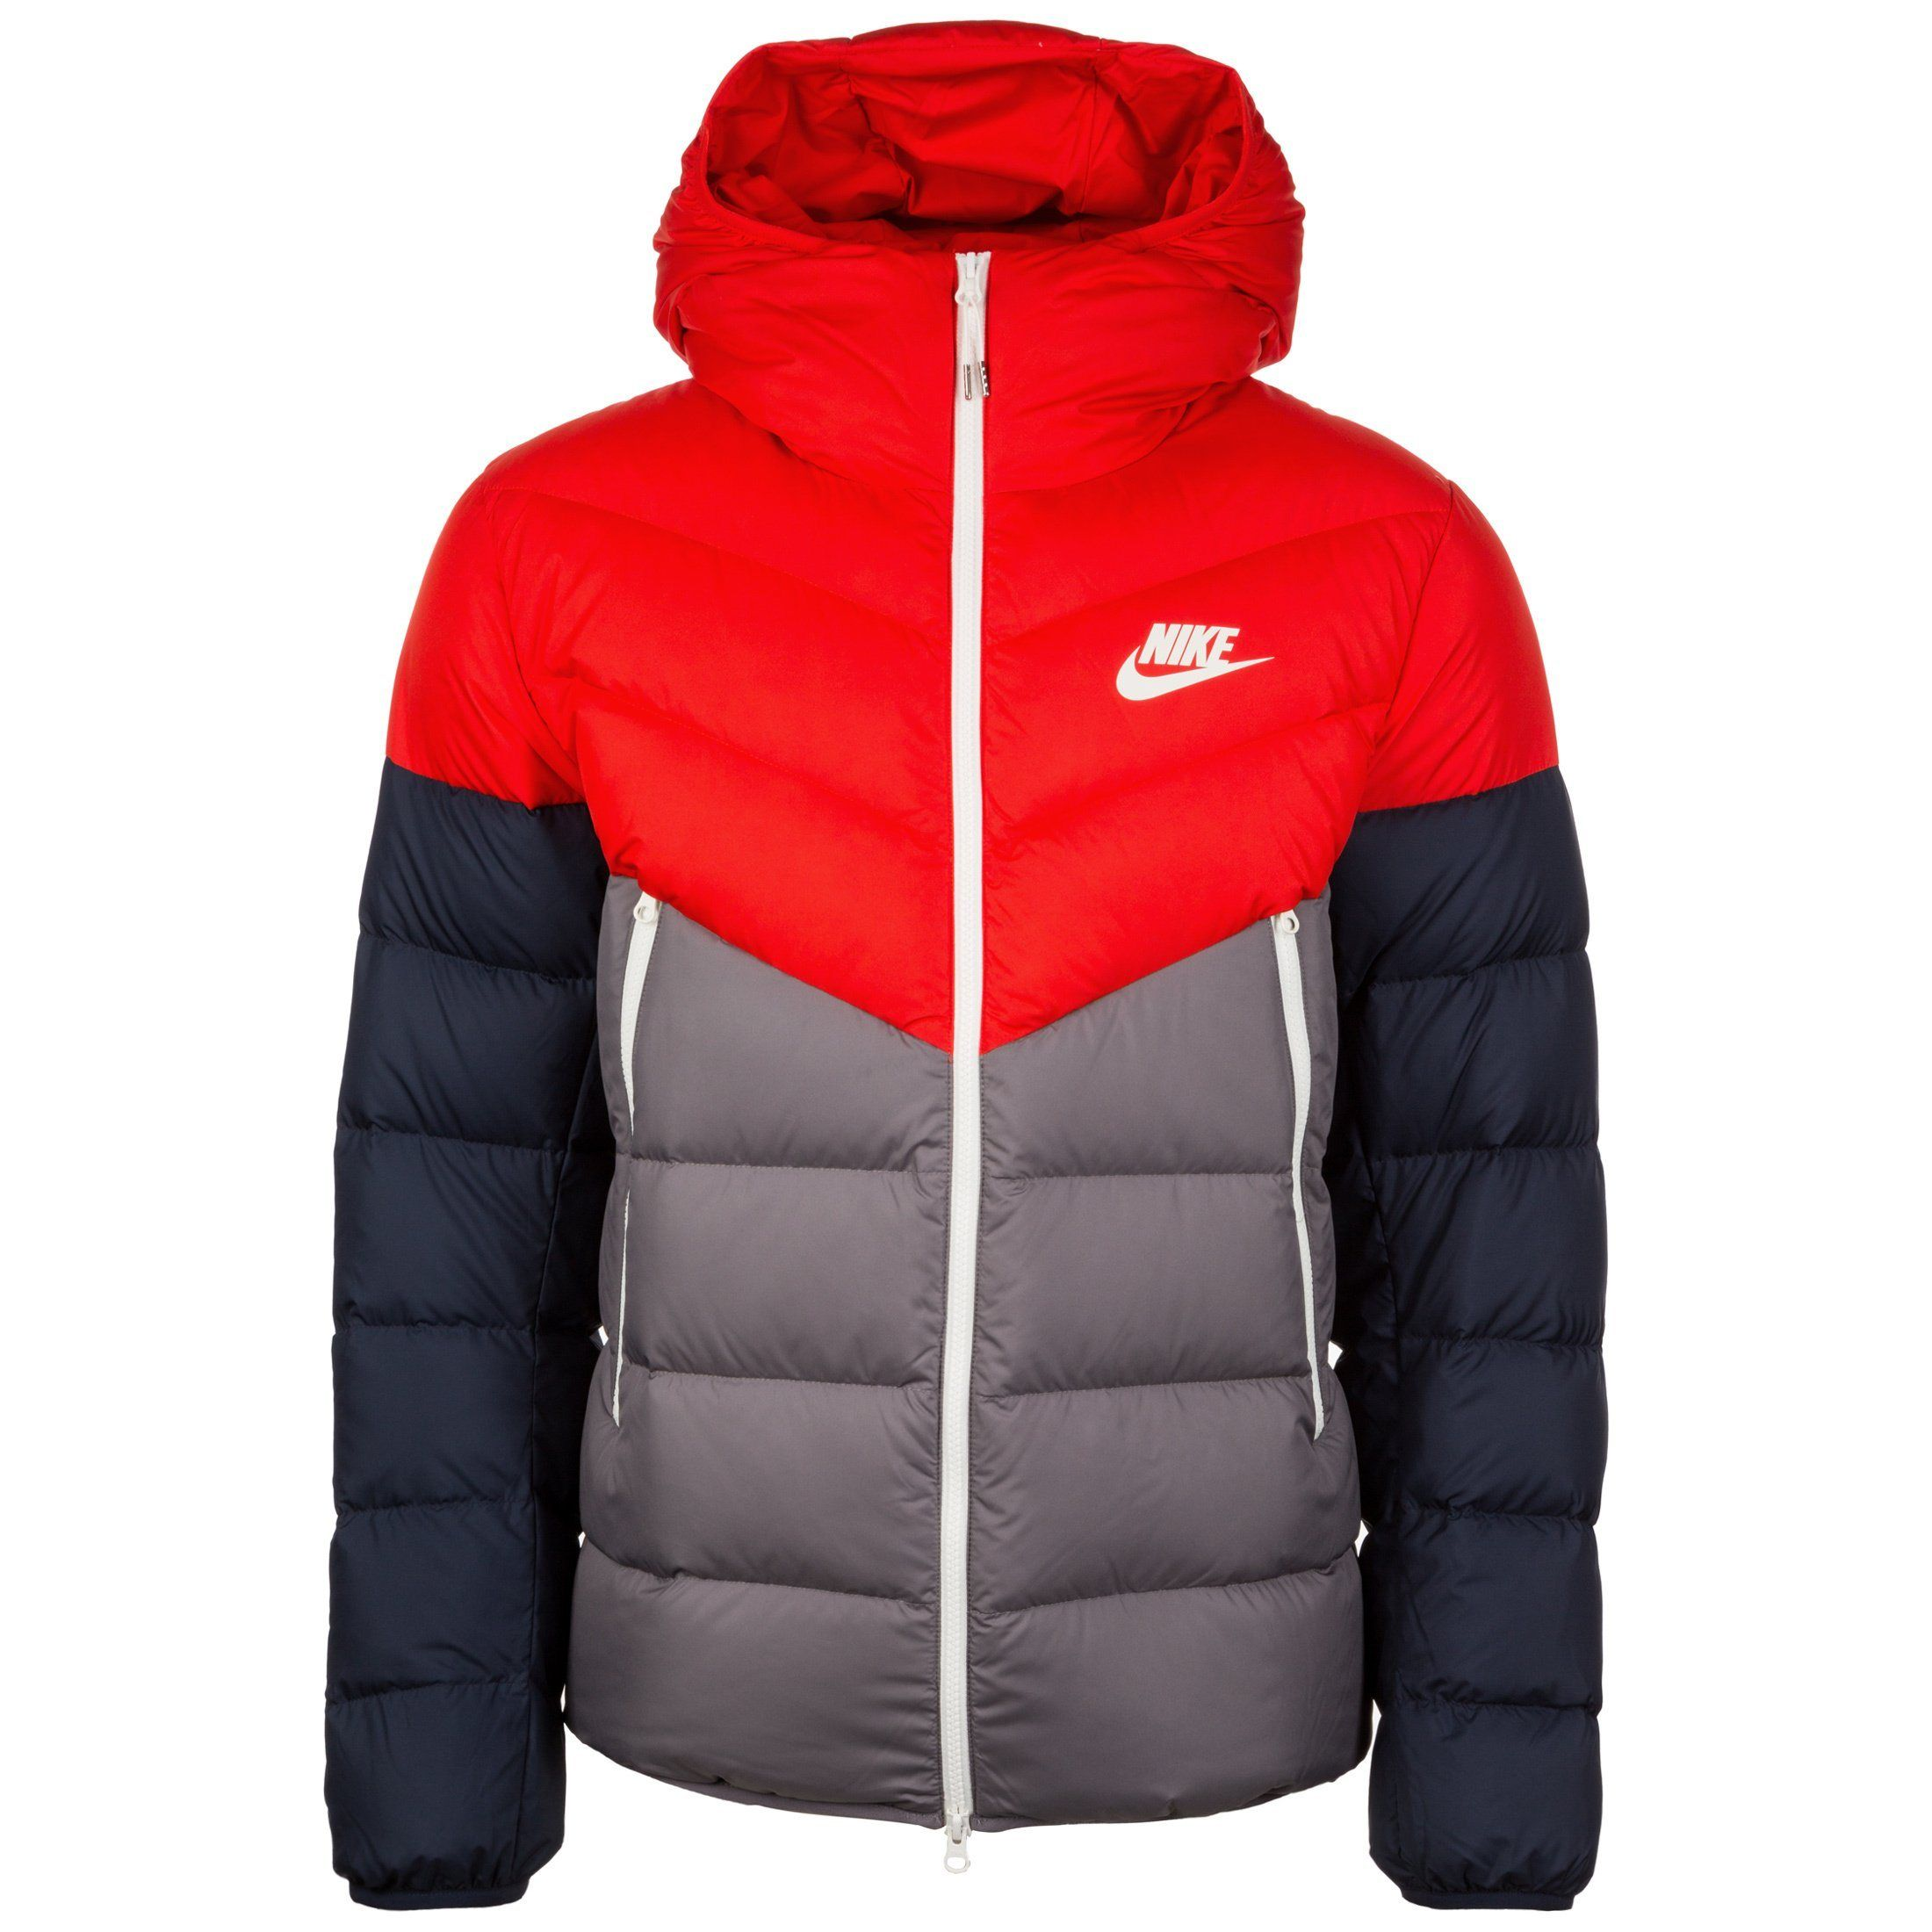 OTTO  NIKE  Bekleidung  Jacken  Winterjacken  Herren  Nike  Sportswear 393acec0e6